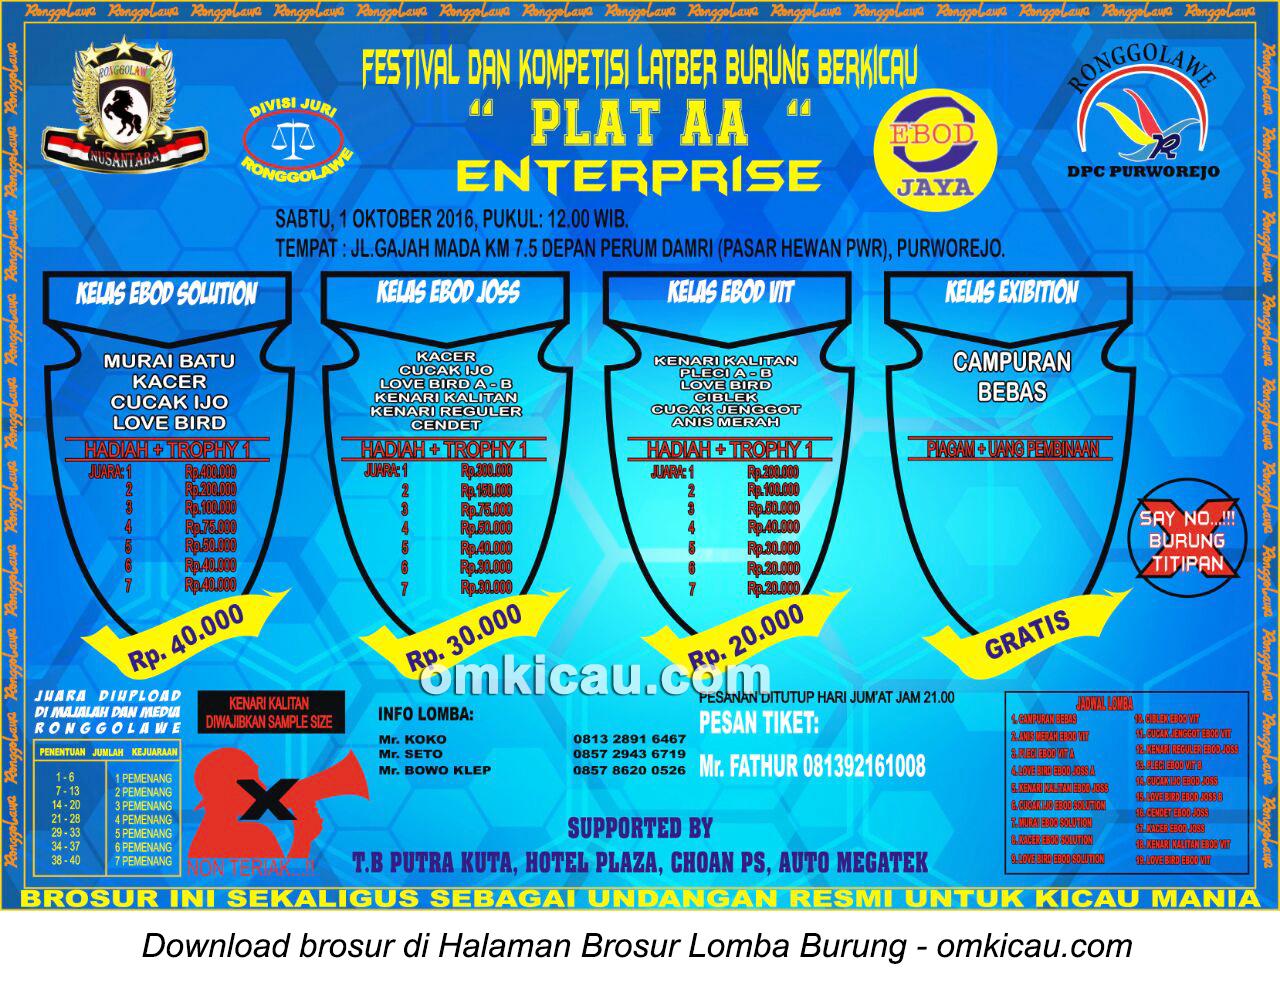 Brosur Latber Burung Berkicau Plat AA Enterprise, Purworejo, 1 Oktober 2016